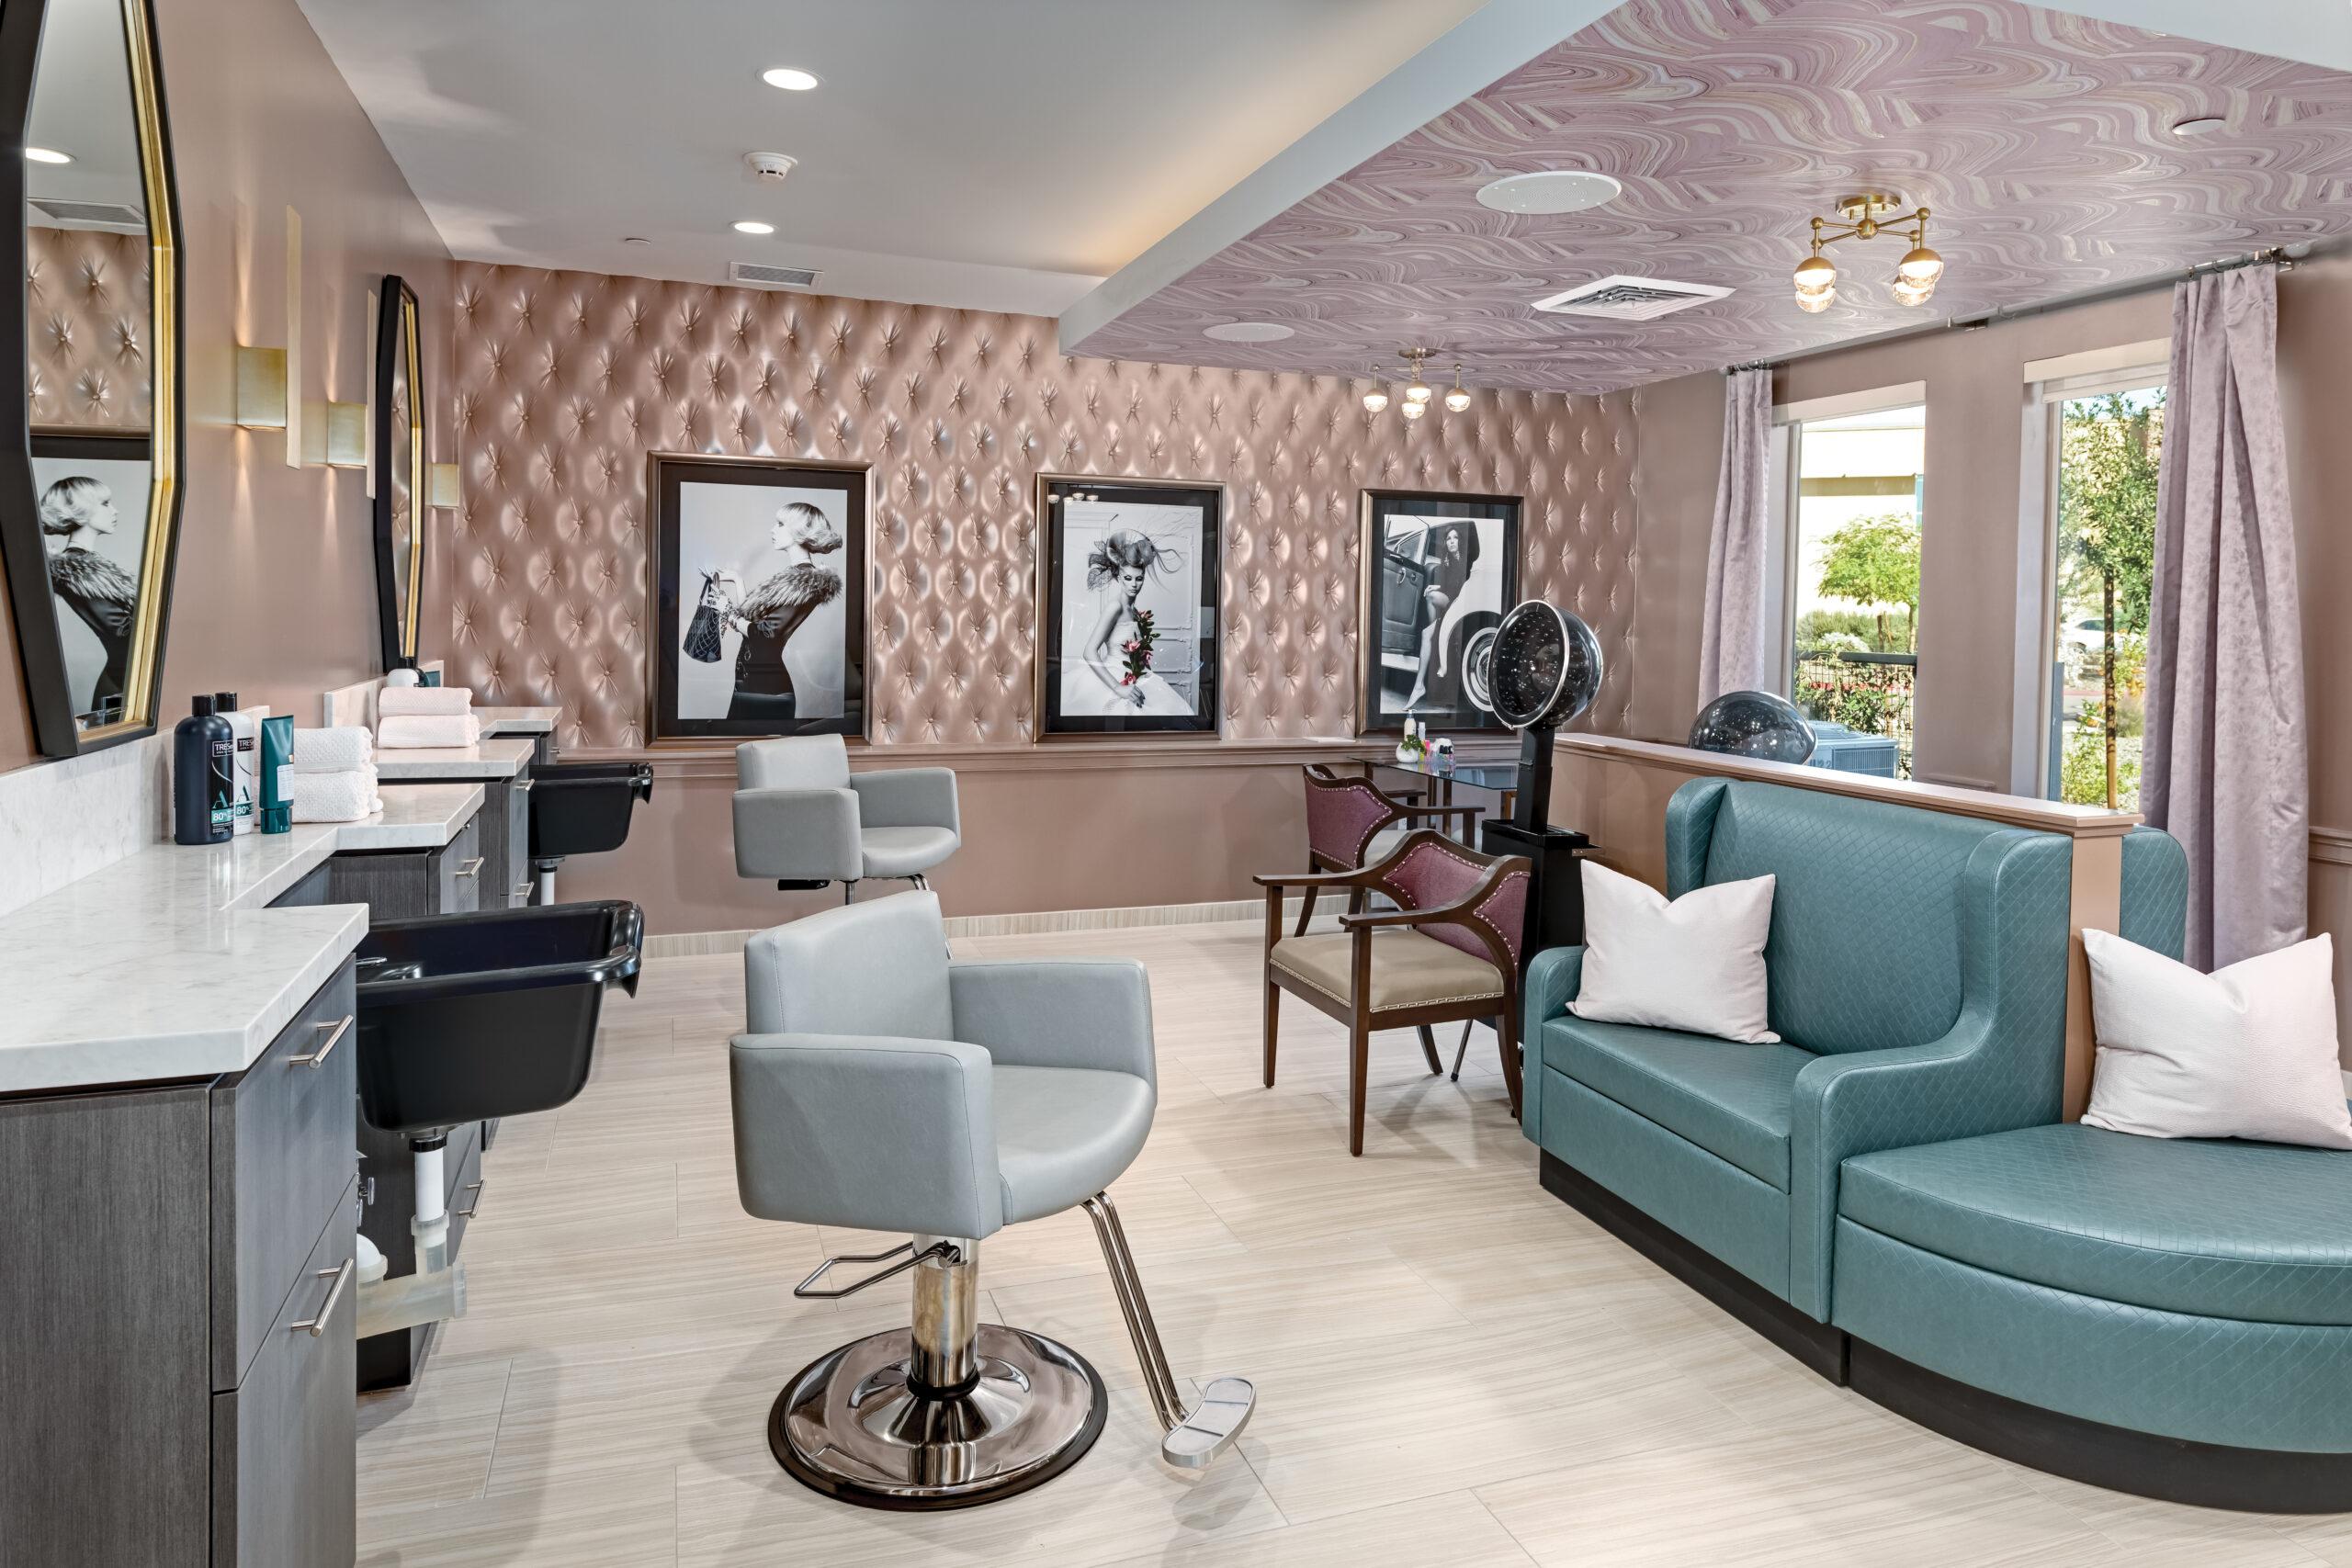 Feminine Salon, pink walls and green seating